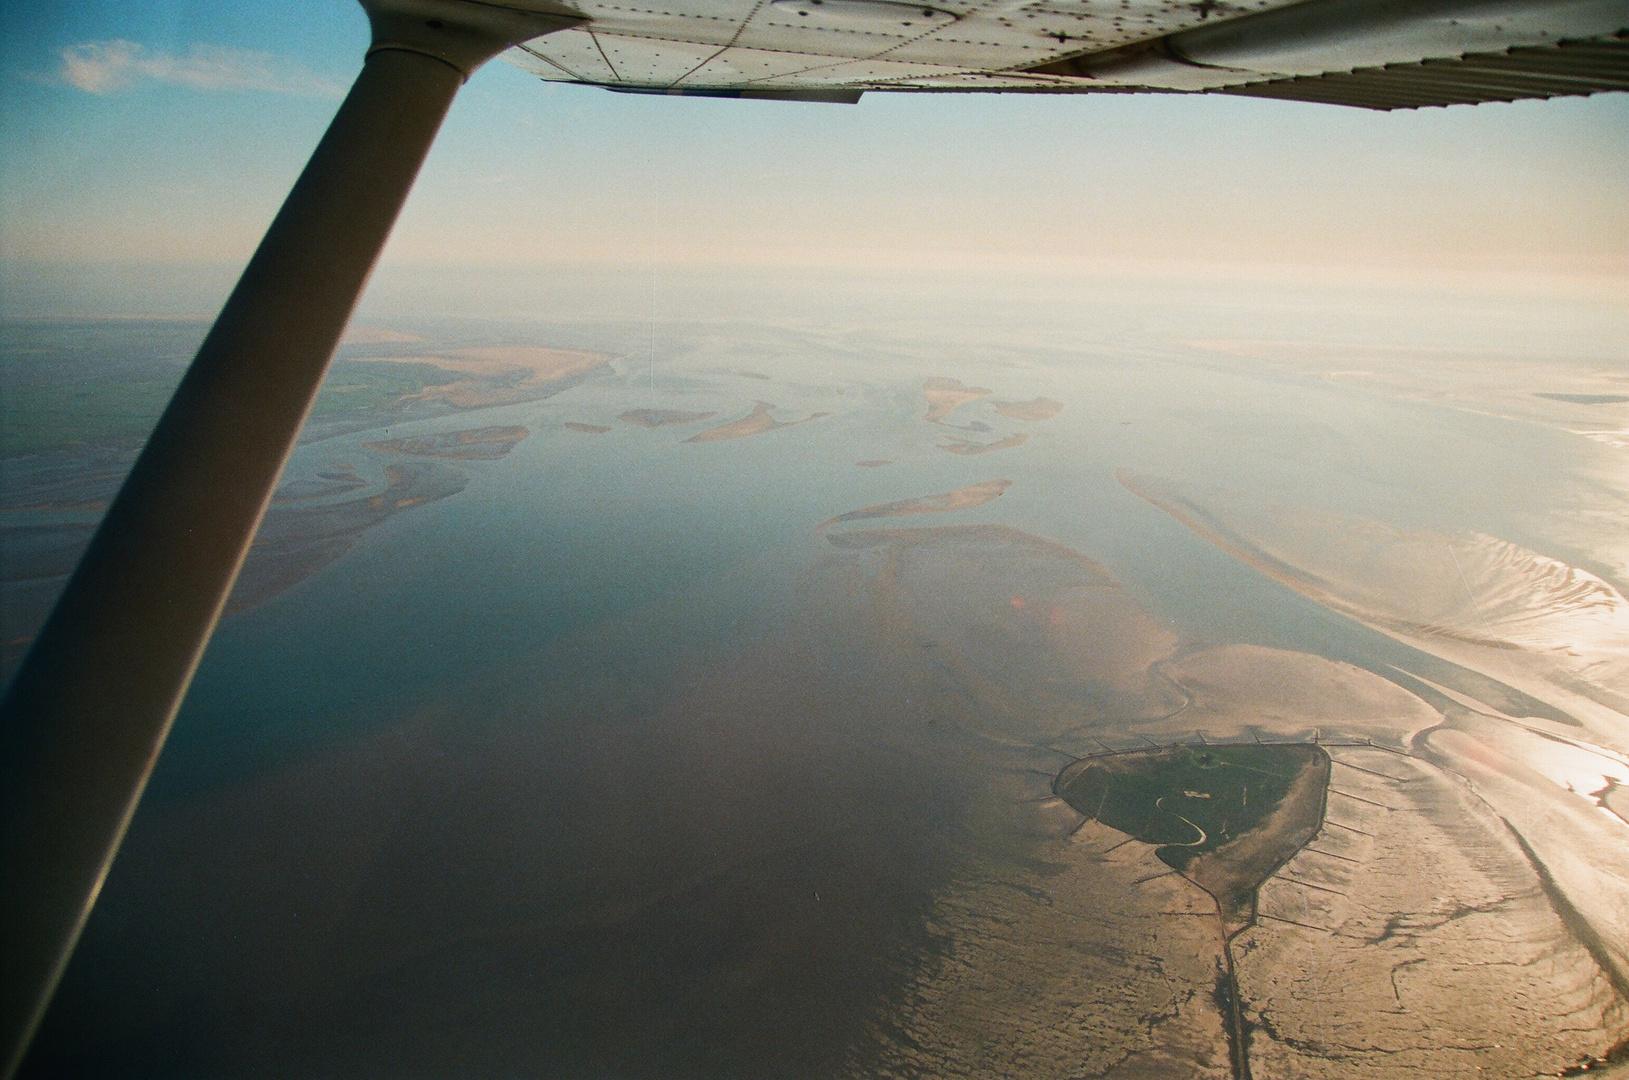 Flug über das Wattenmeer